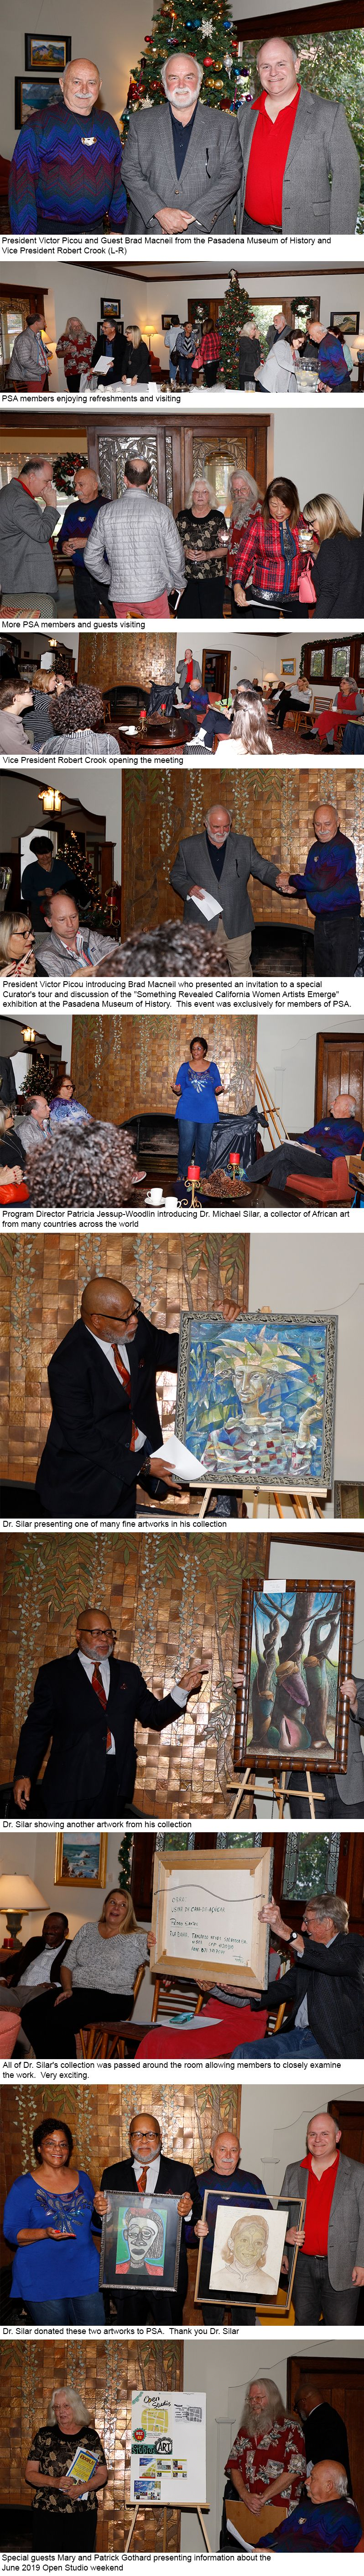 December 2018 Meeting